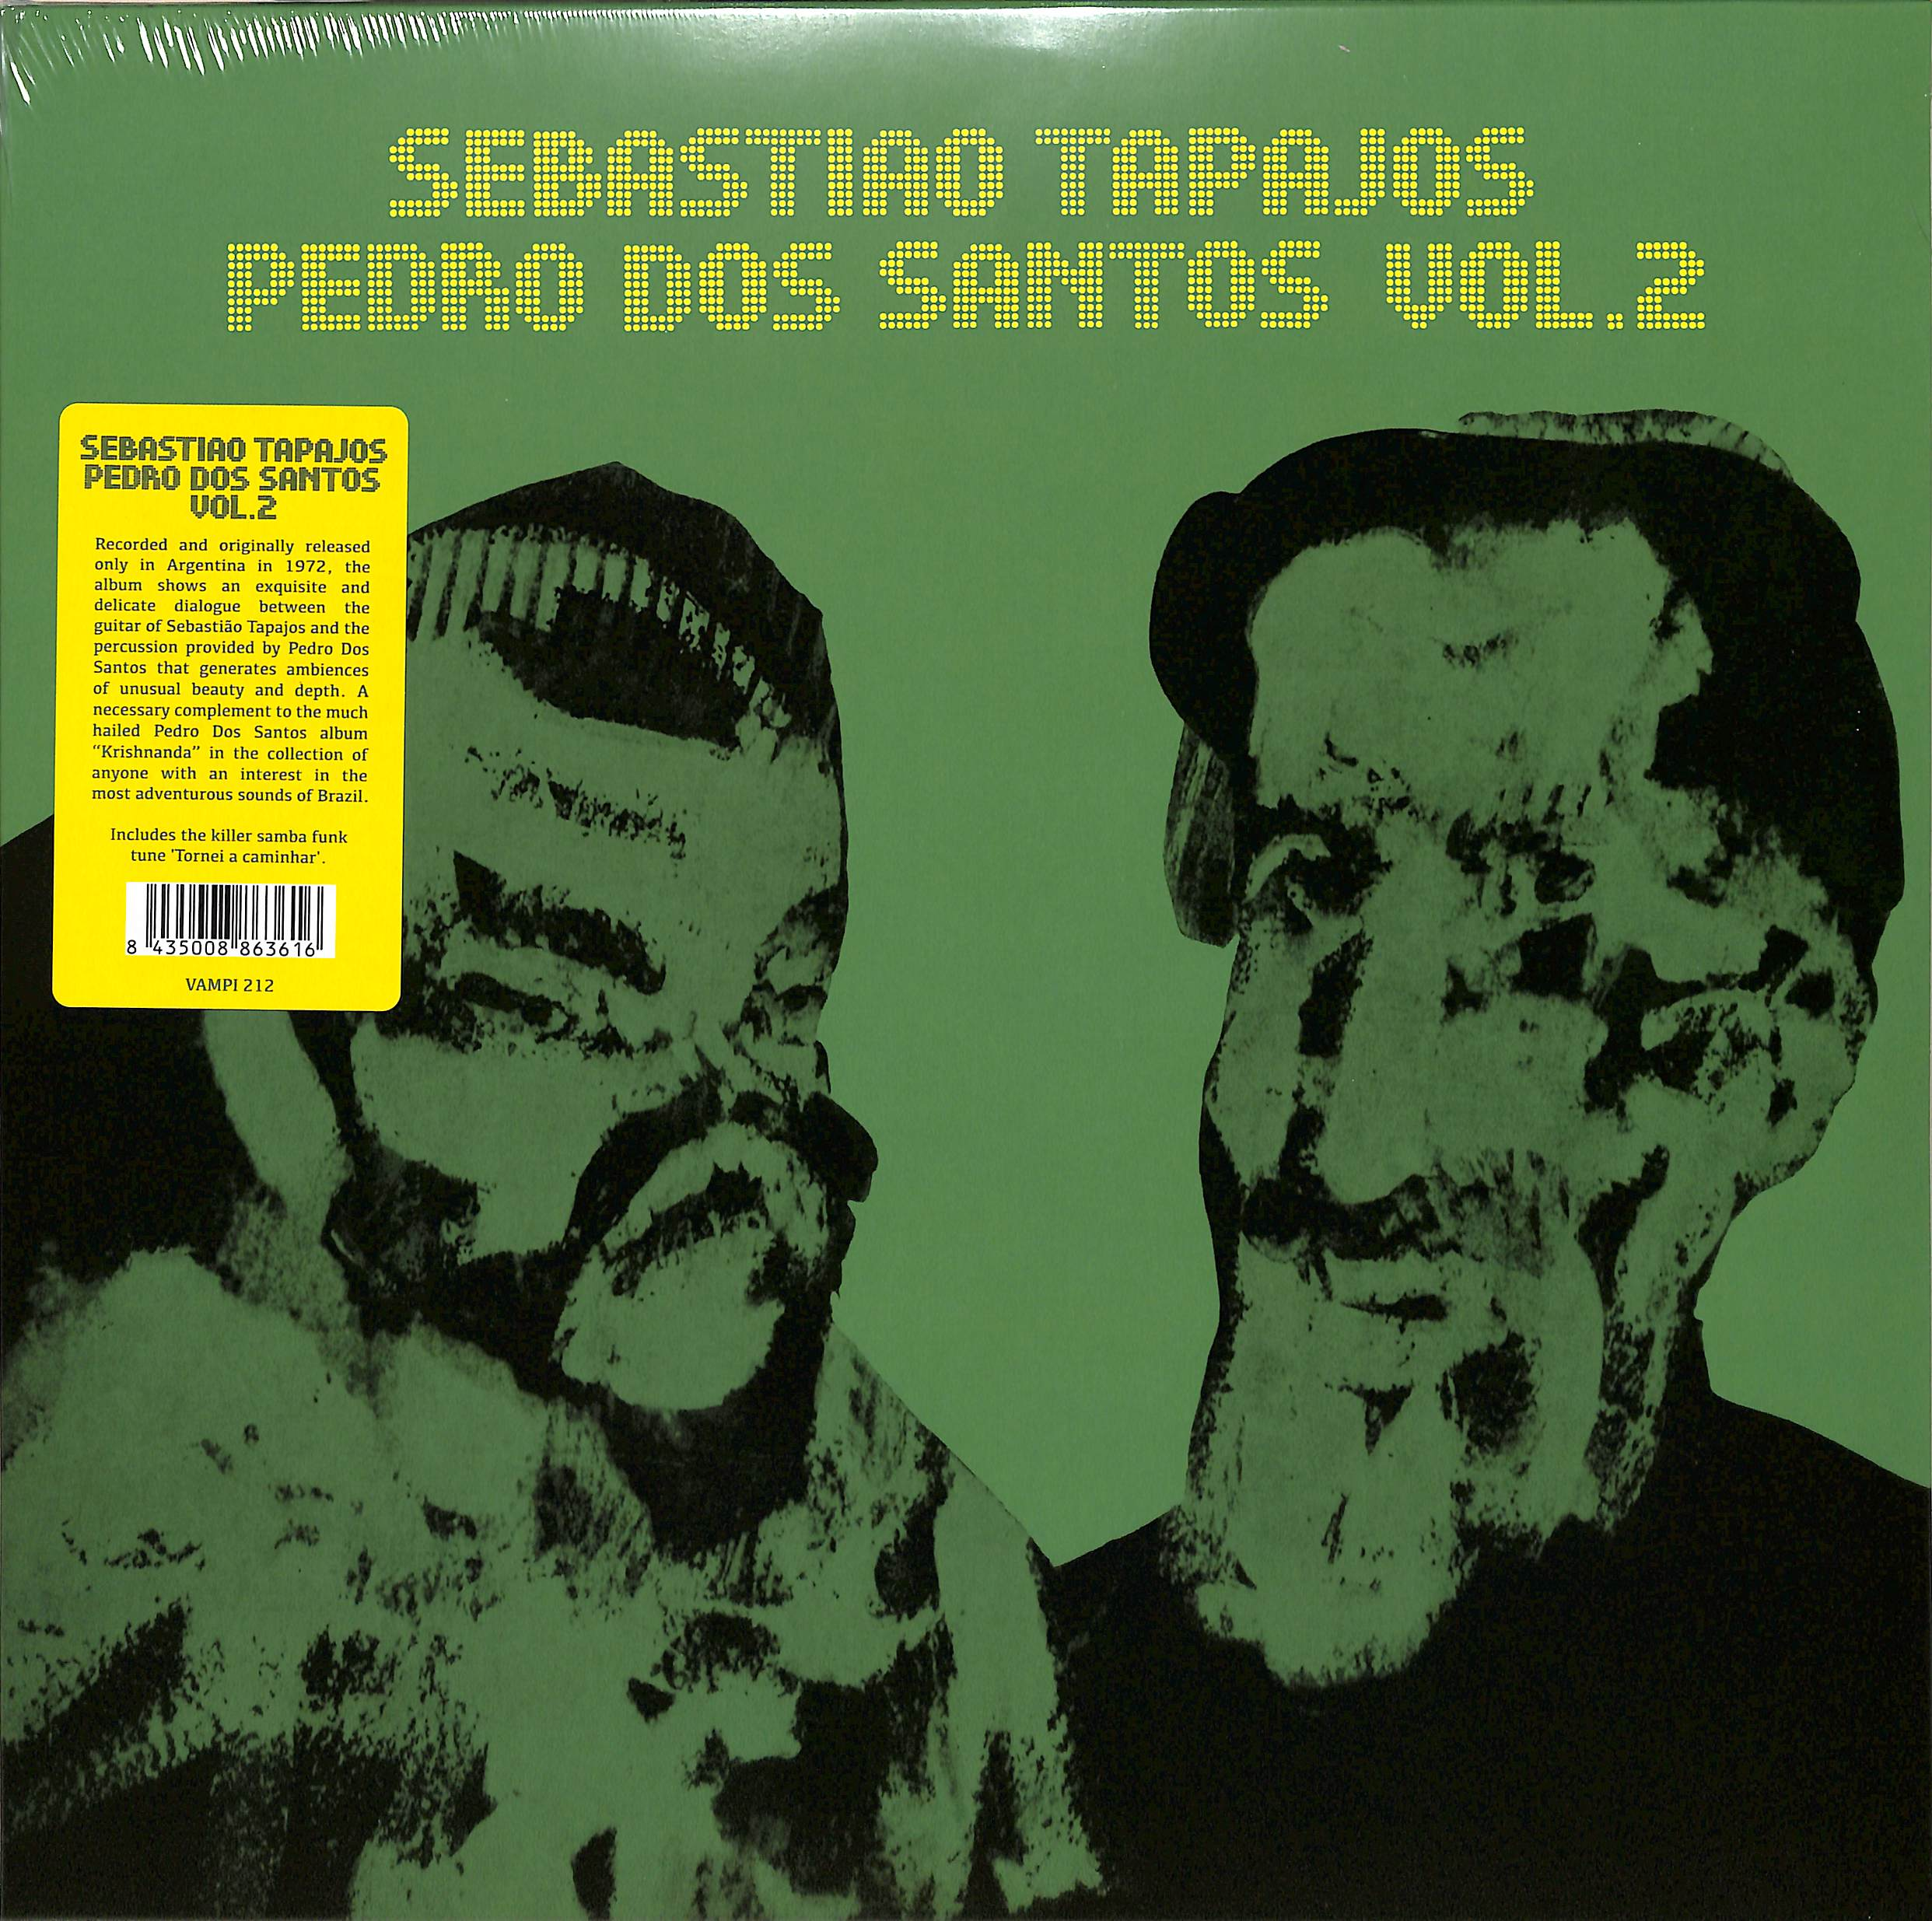 Sebastiao Tapajos & Pedro Dos Santos - VOL.2